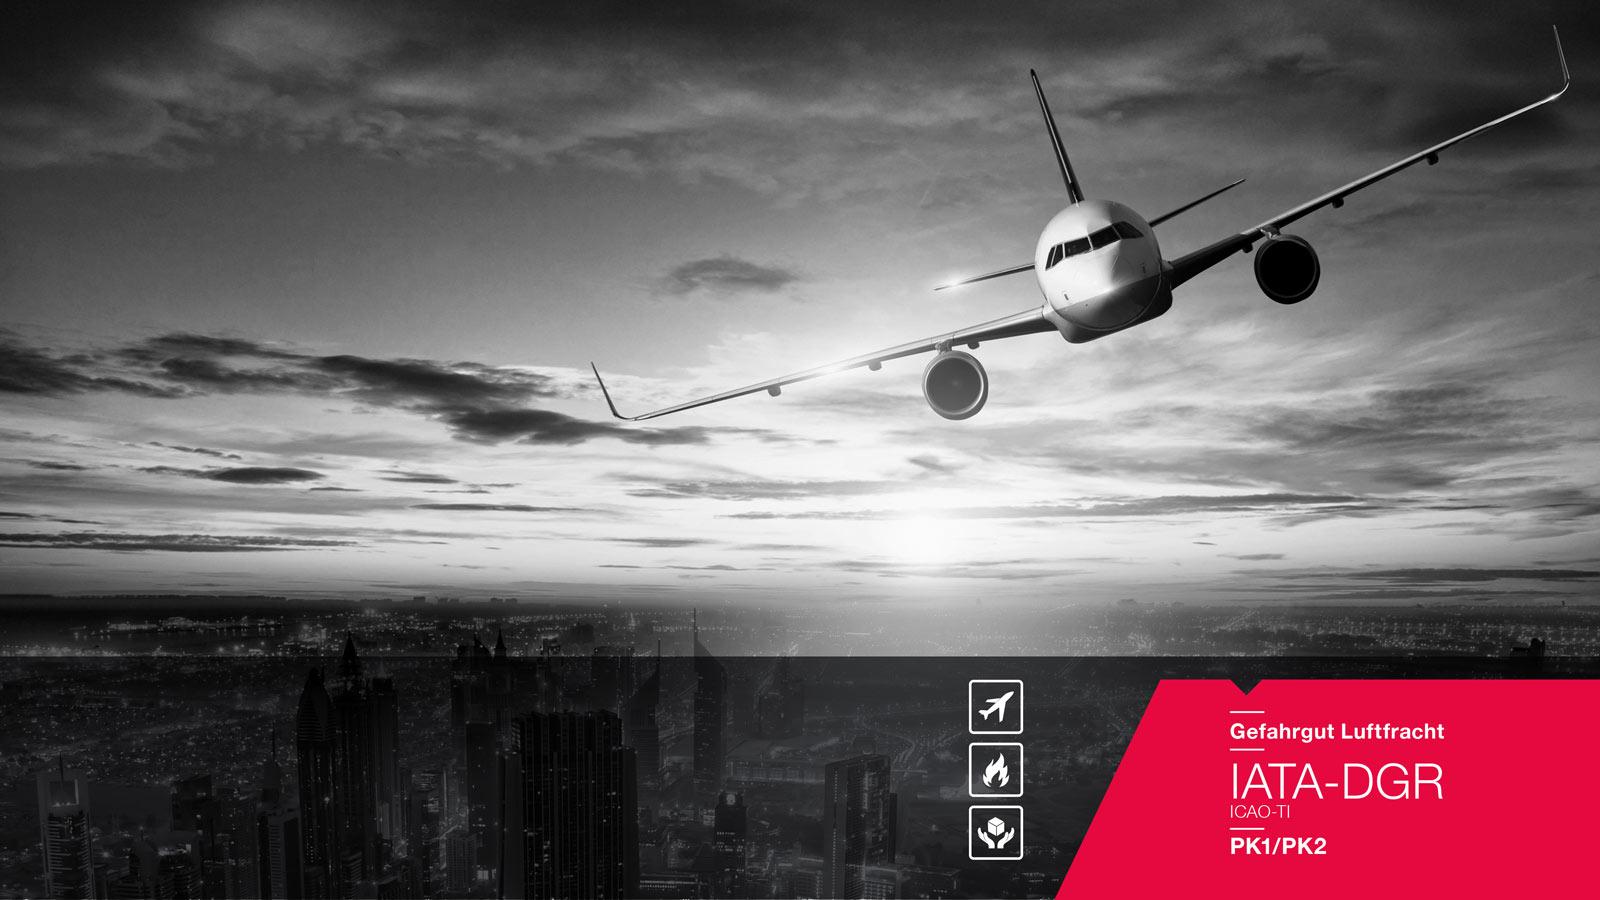 Gefahrgut Luftfracht – IATA-DGR / ICAO-TI (PK1/PK2)